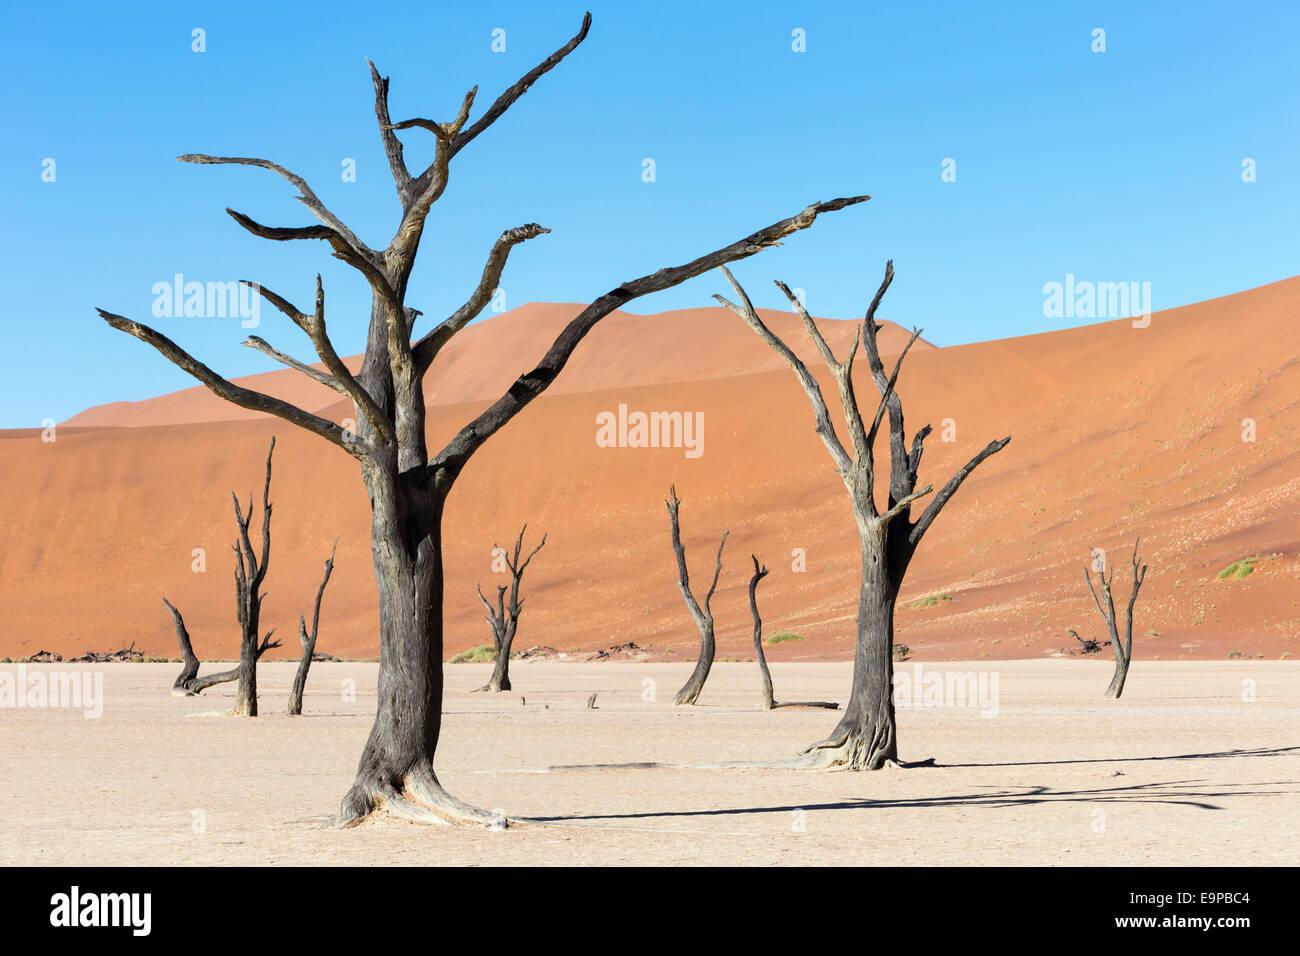 Dead Vlei, Namib Desert, Namibia - Stock Image